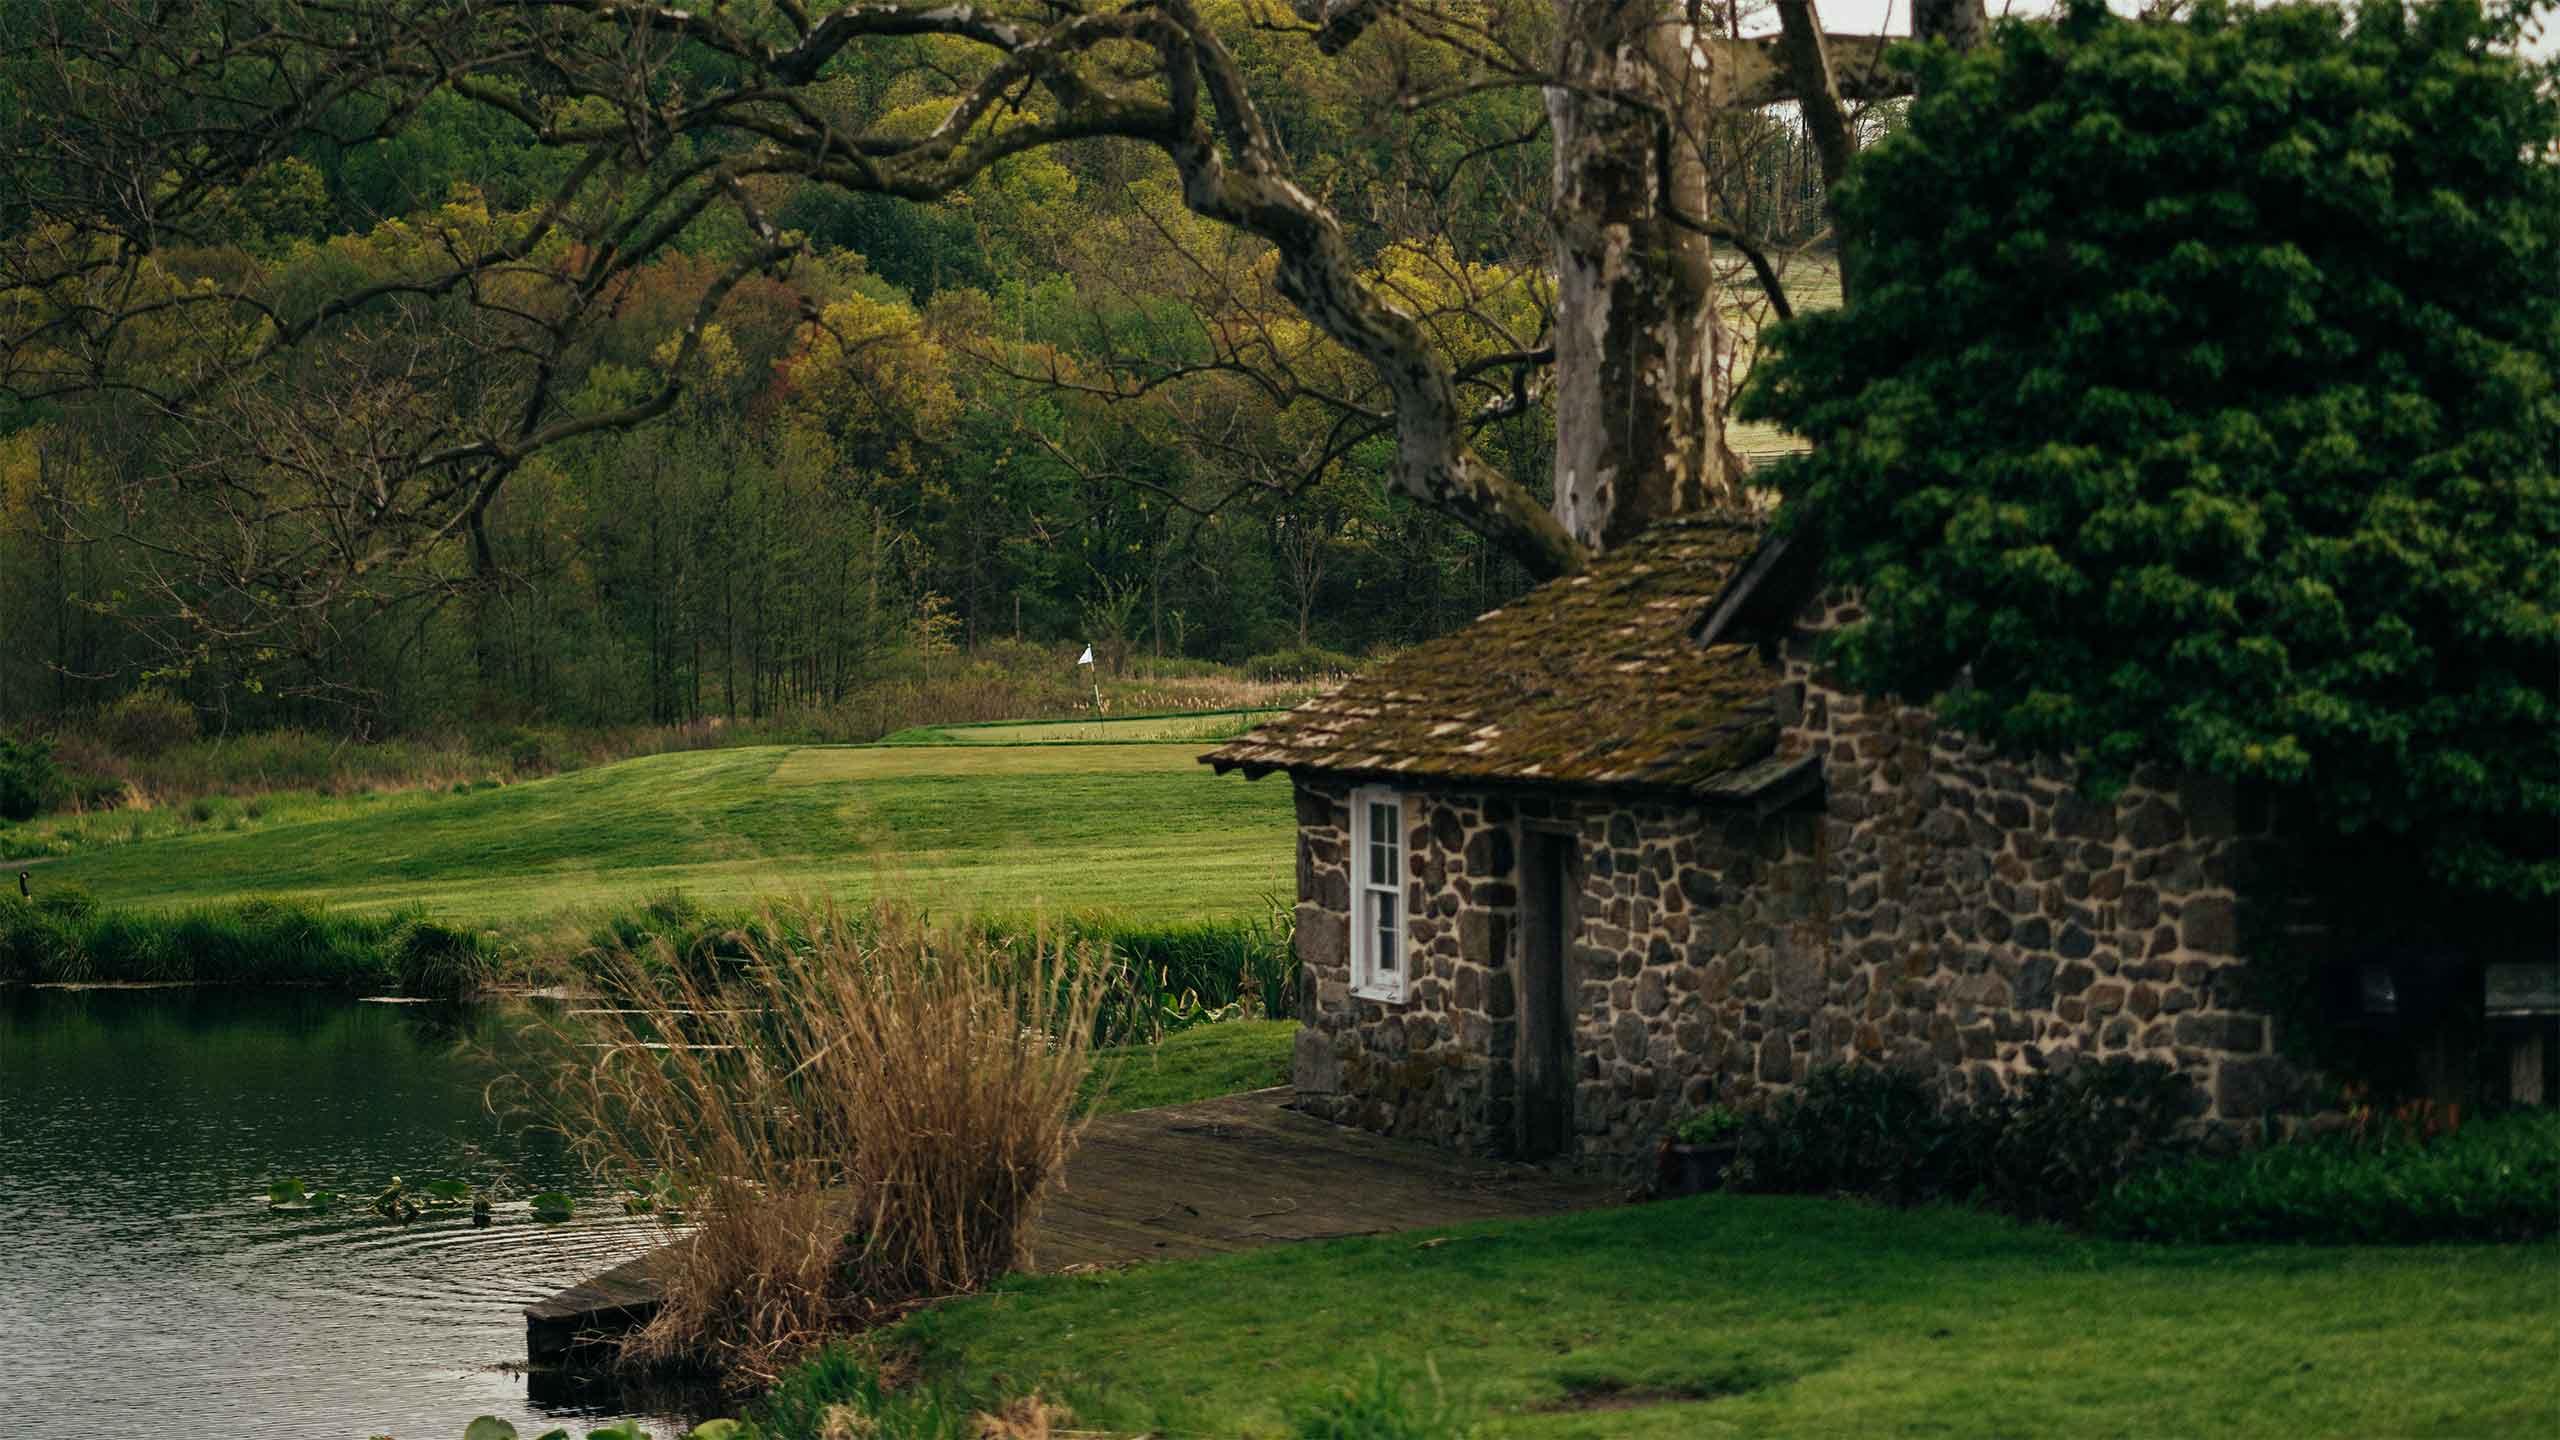 French Creek Golf Club in Elverson, Pa.